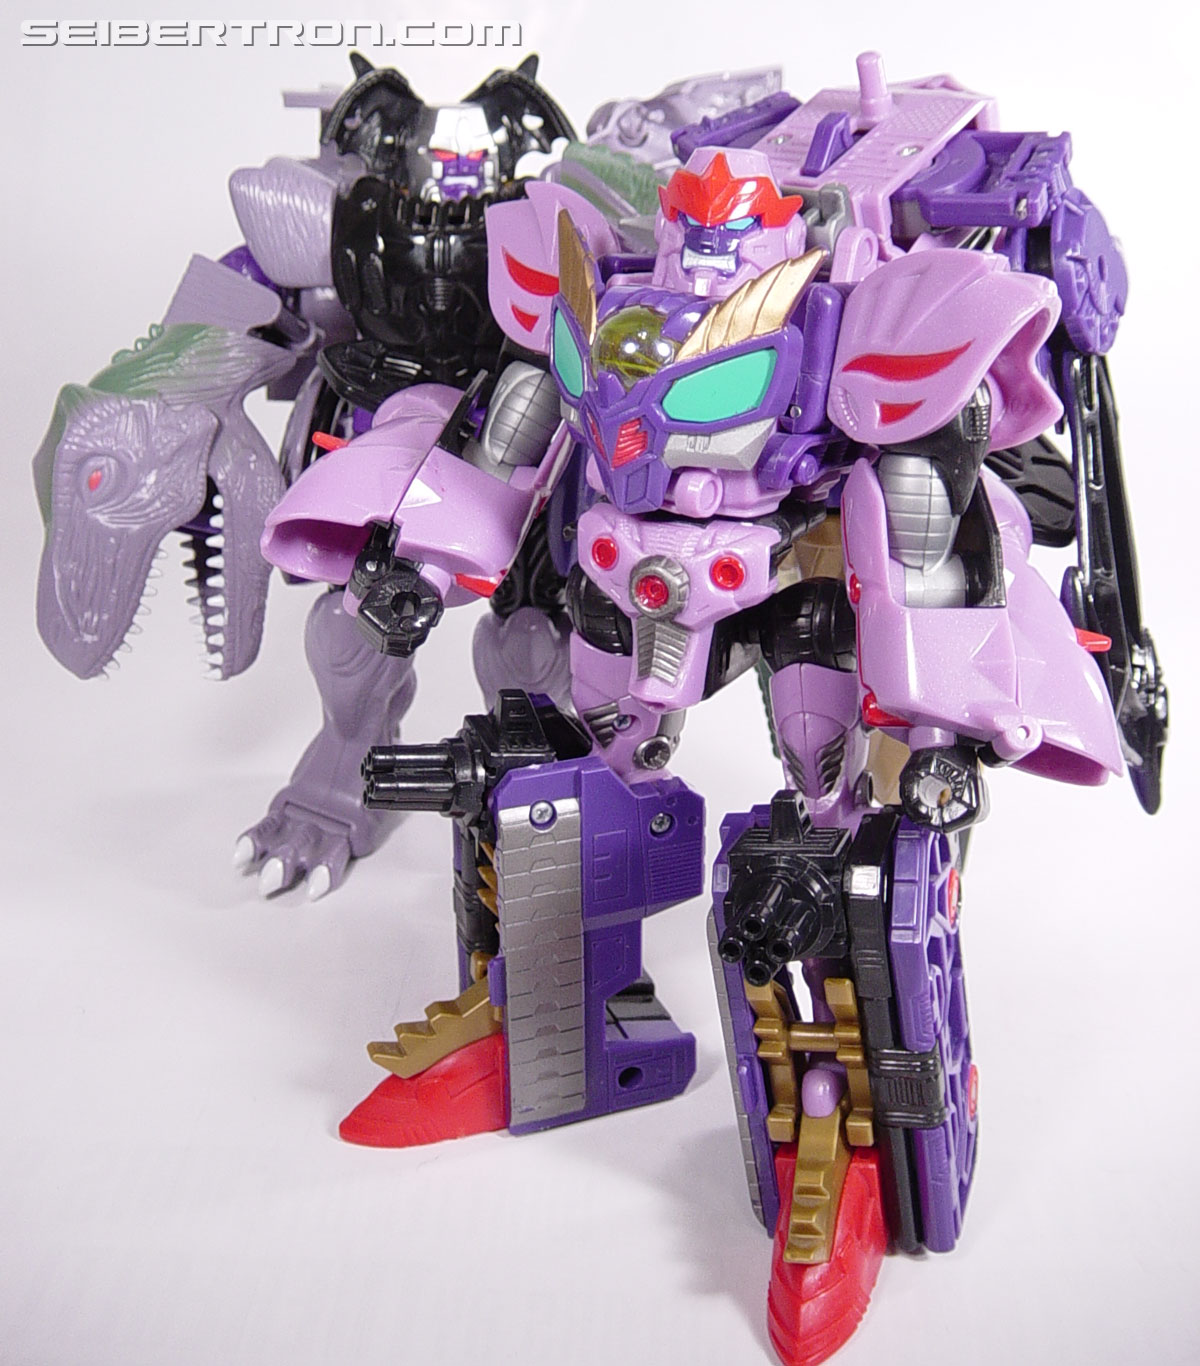 Transformers Beast Wars II Galvatron (Image #68 of 73)